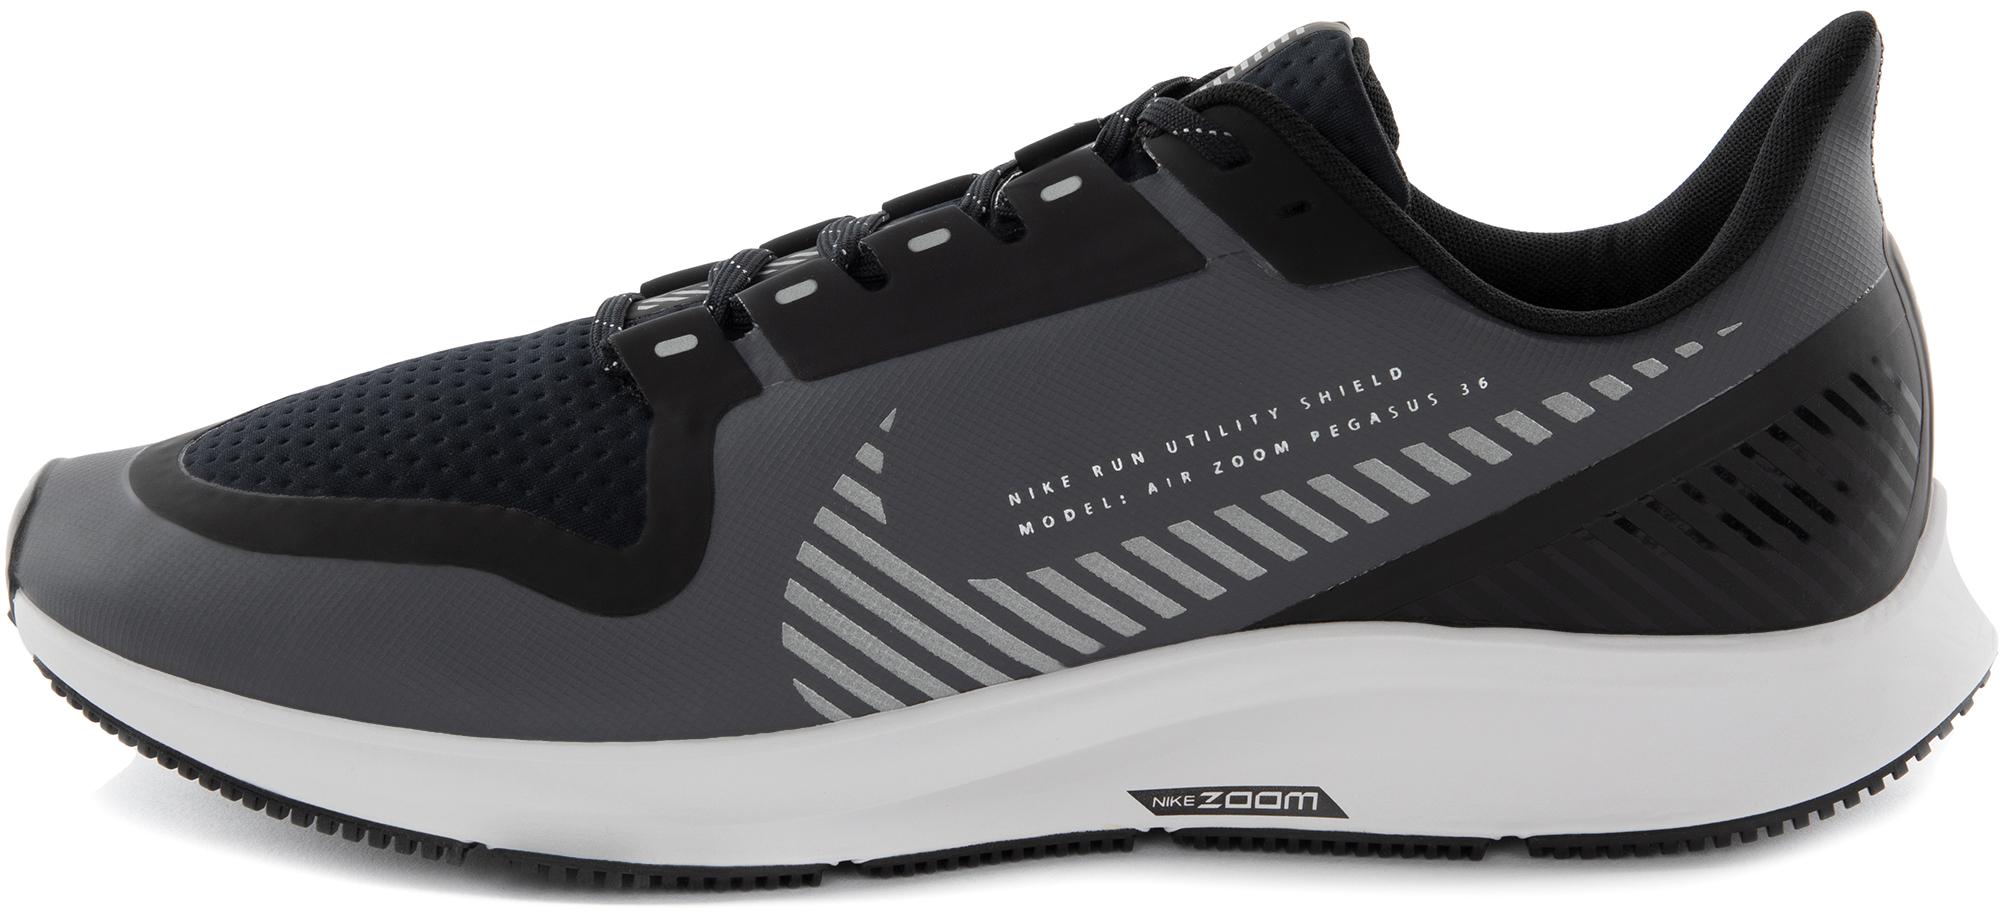 Nike Кроссовки мужские Nike Zoom Pegasus 36 Shield, размер 45